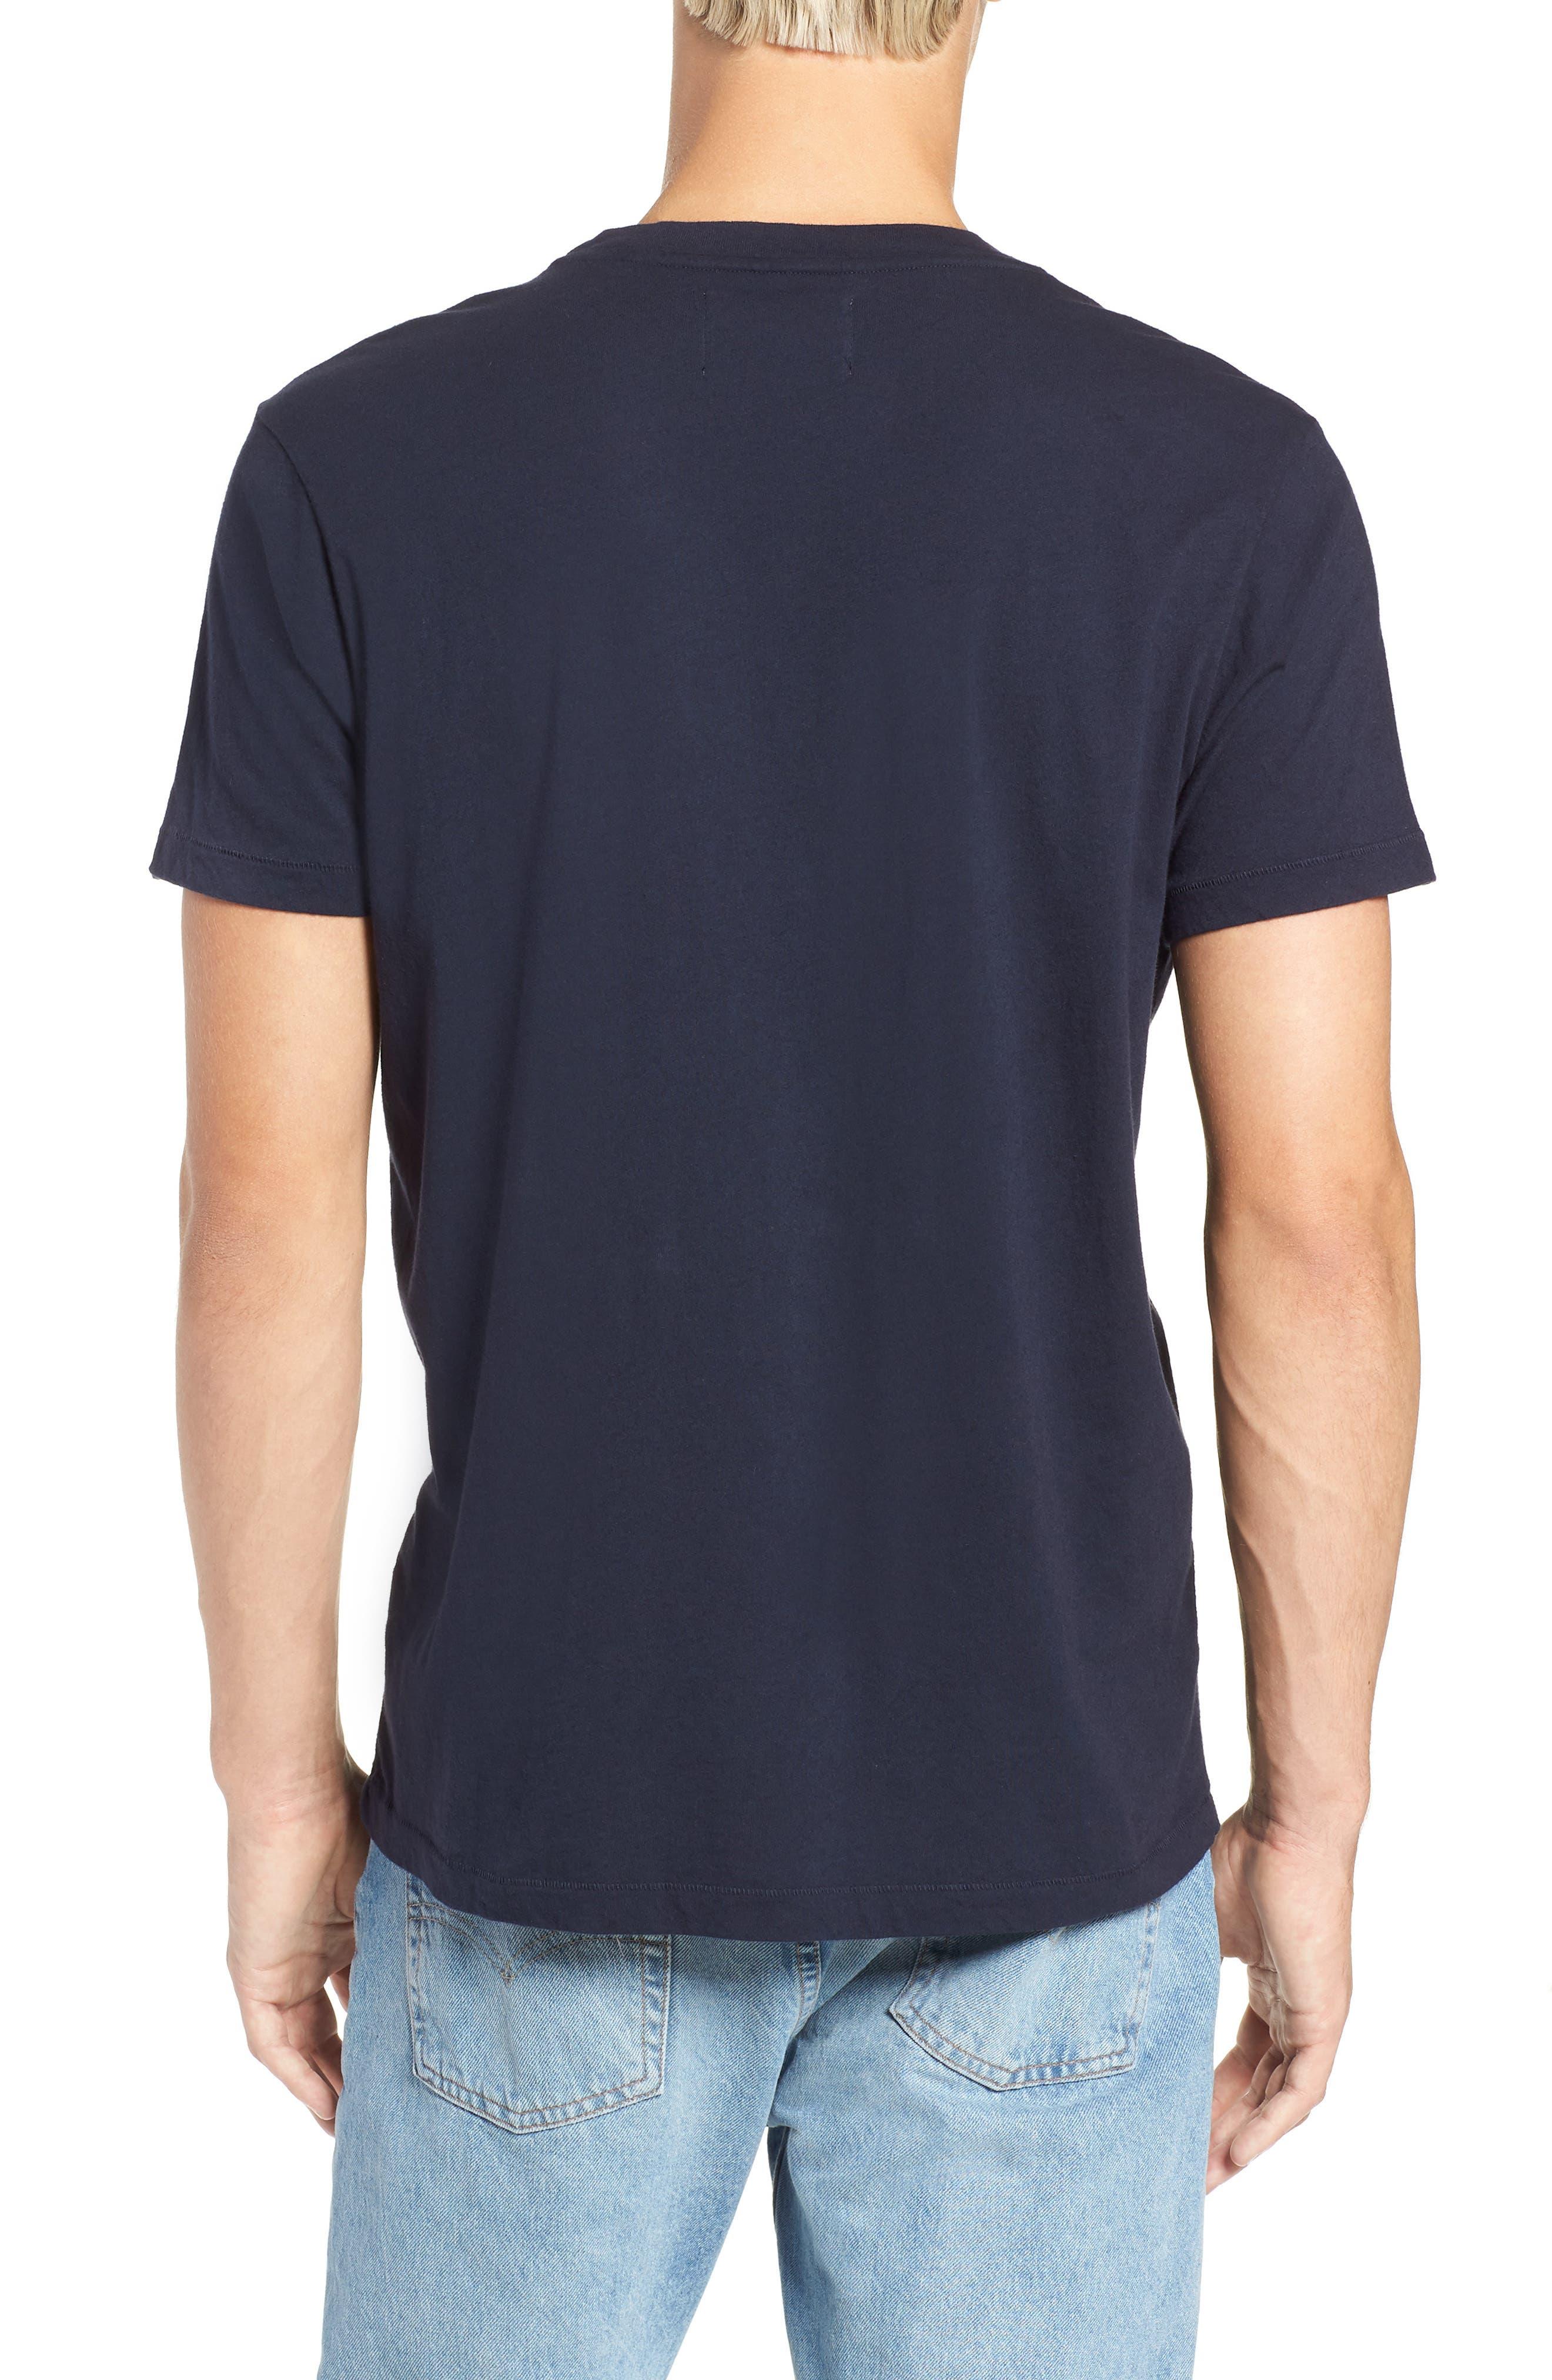 Great Outdoors Pocket T-Shirt,                             Alternate thumbnail 2, color,                             400